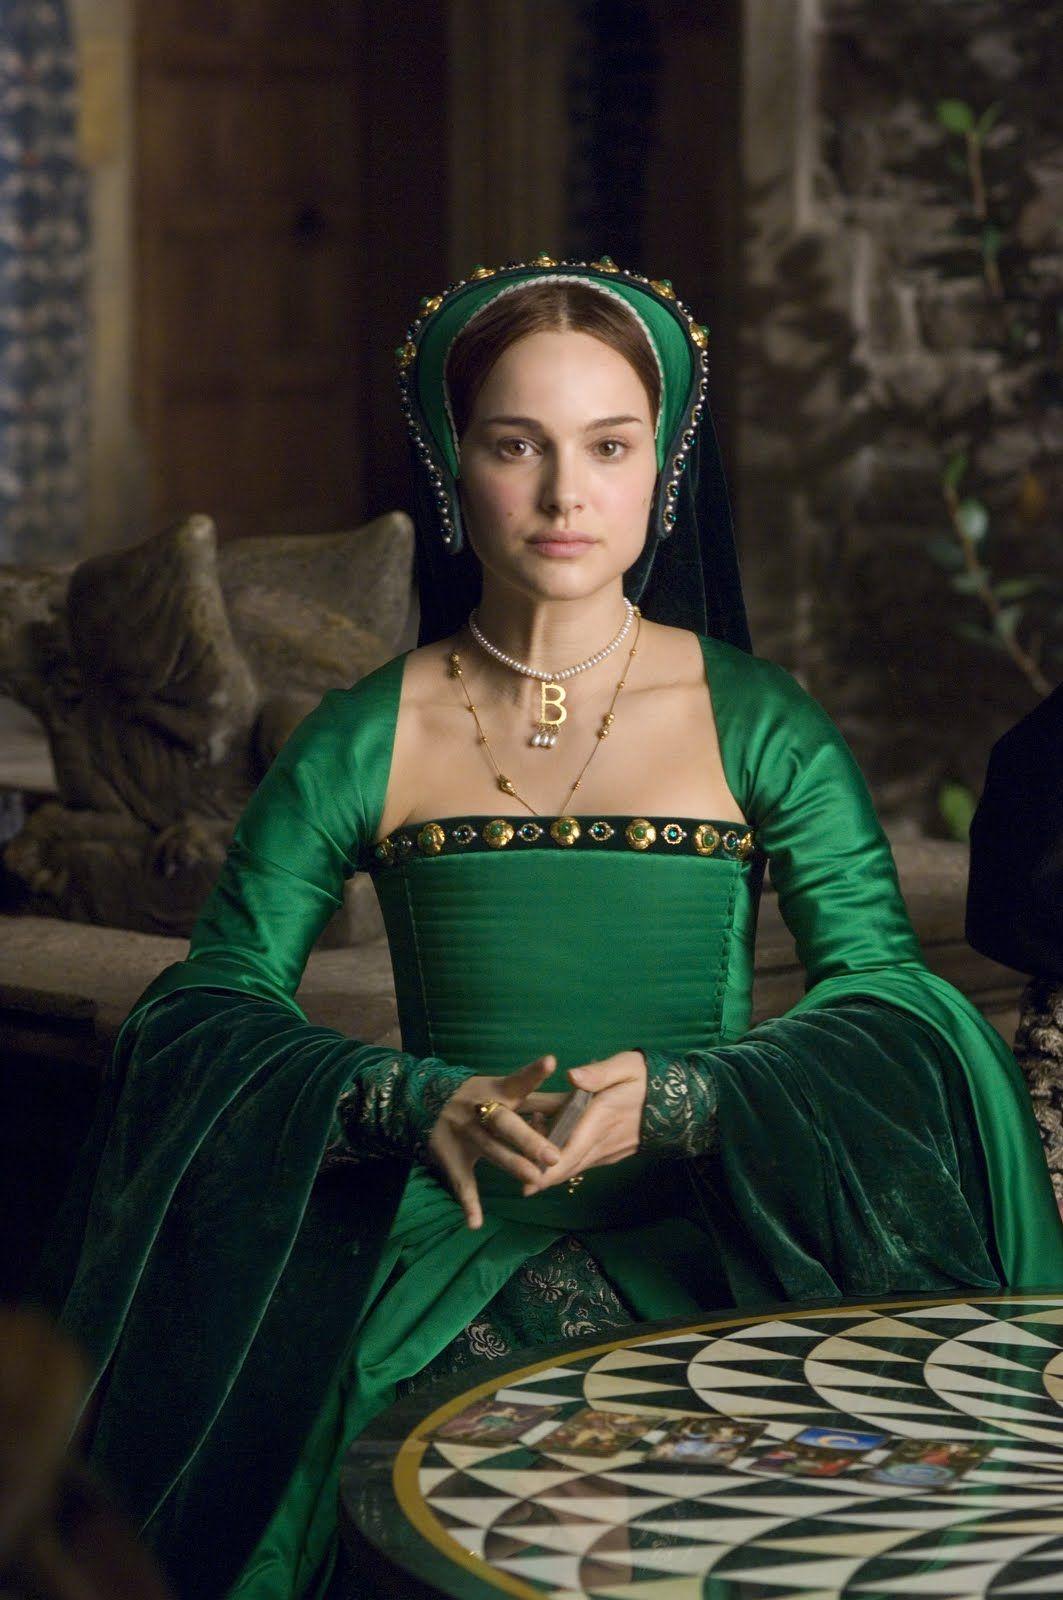 Wednesday Weekly Wishlist Anne S Green Gown The Other Boleyn